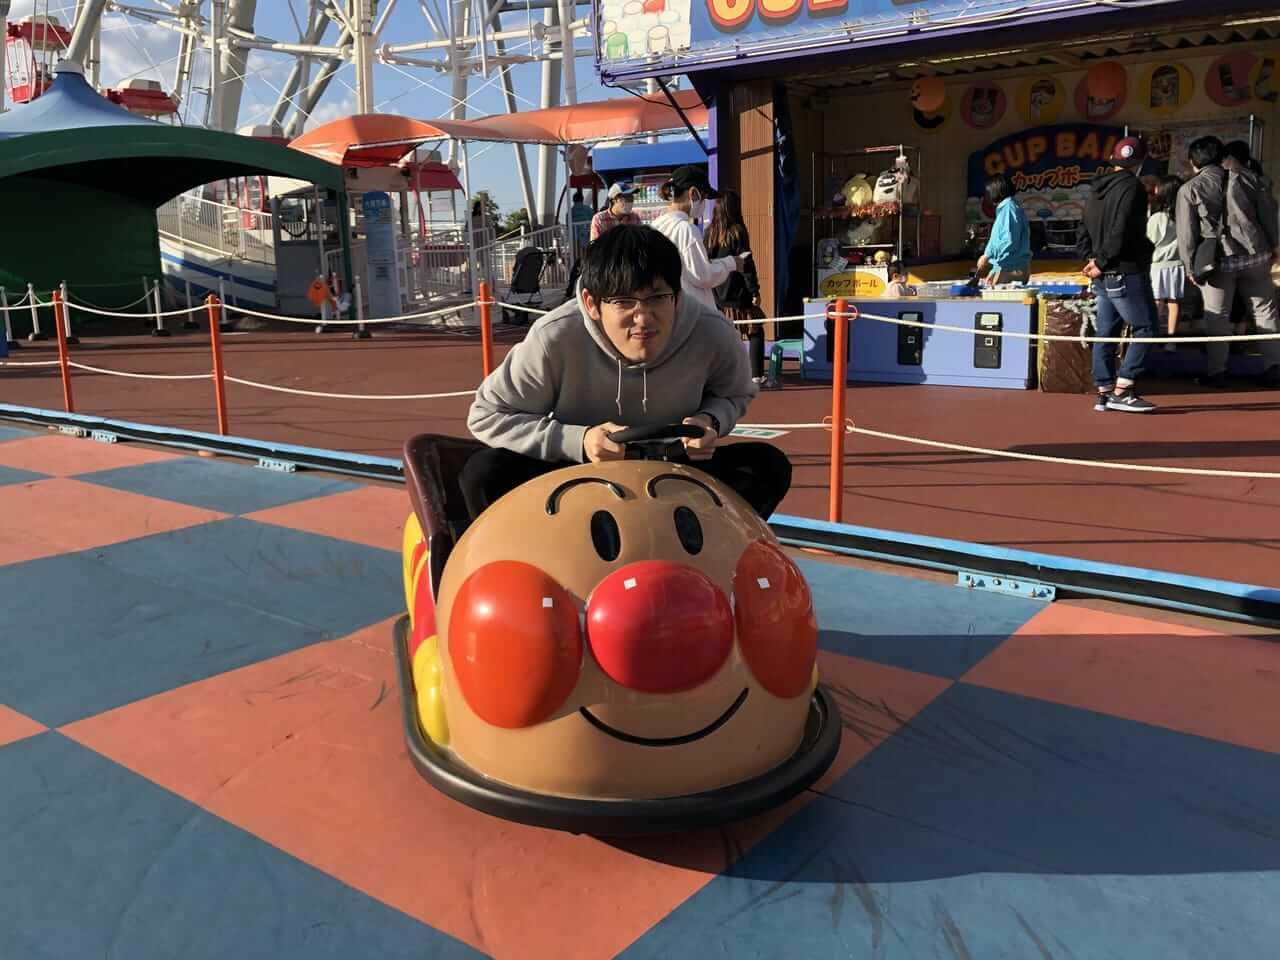 imai(group_inou)インタビュー 「日常生活でも冒険心を忘れないように」